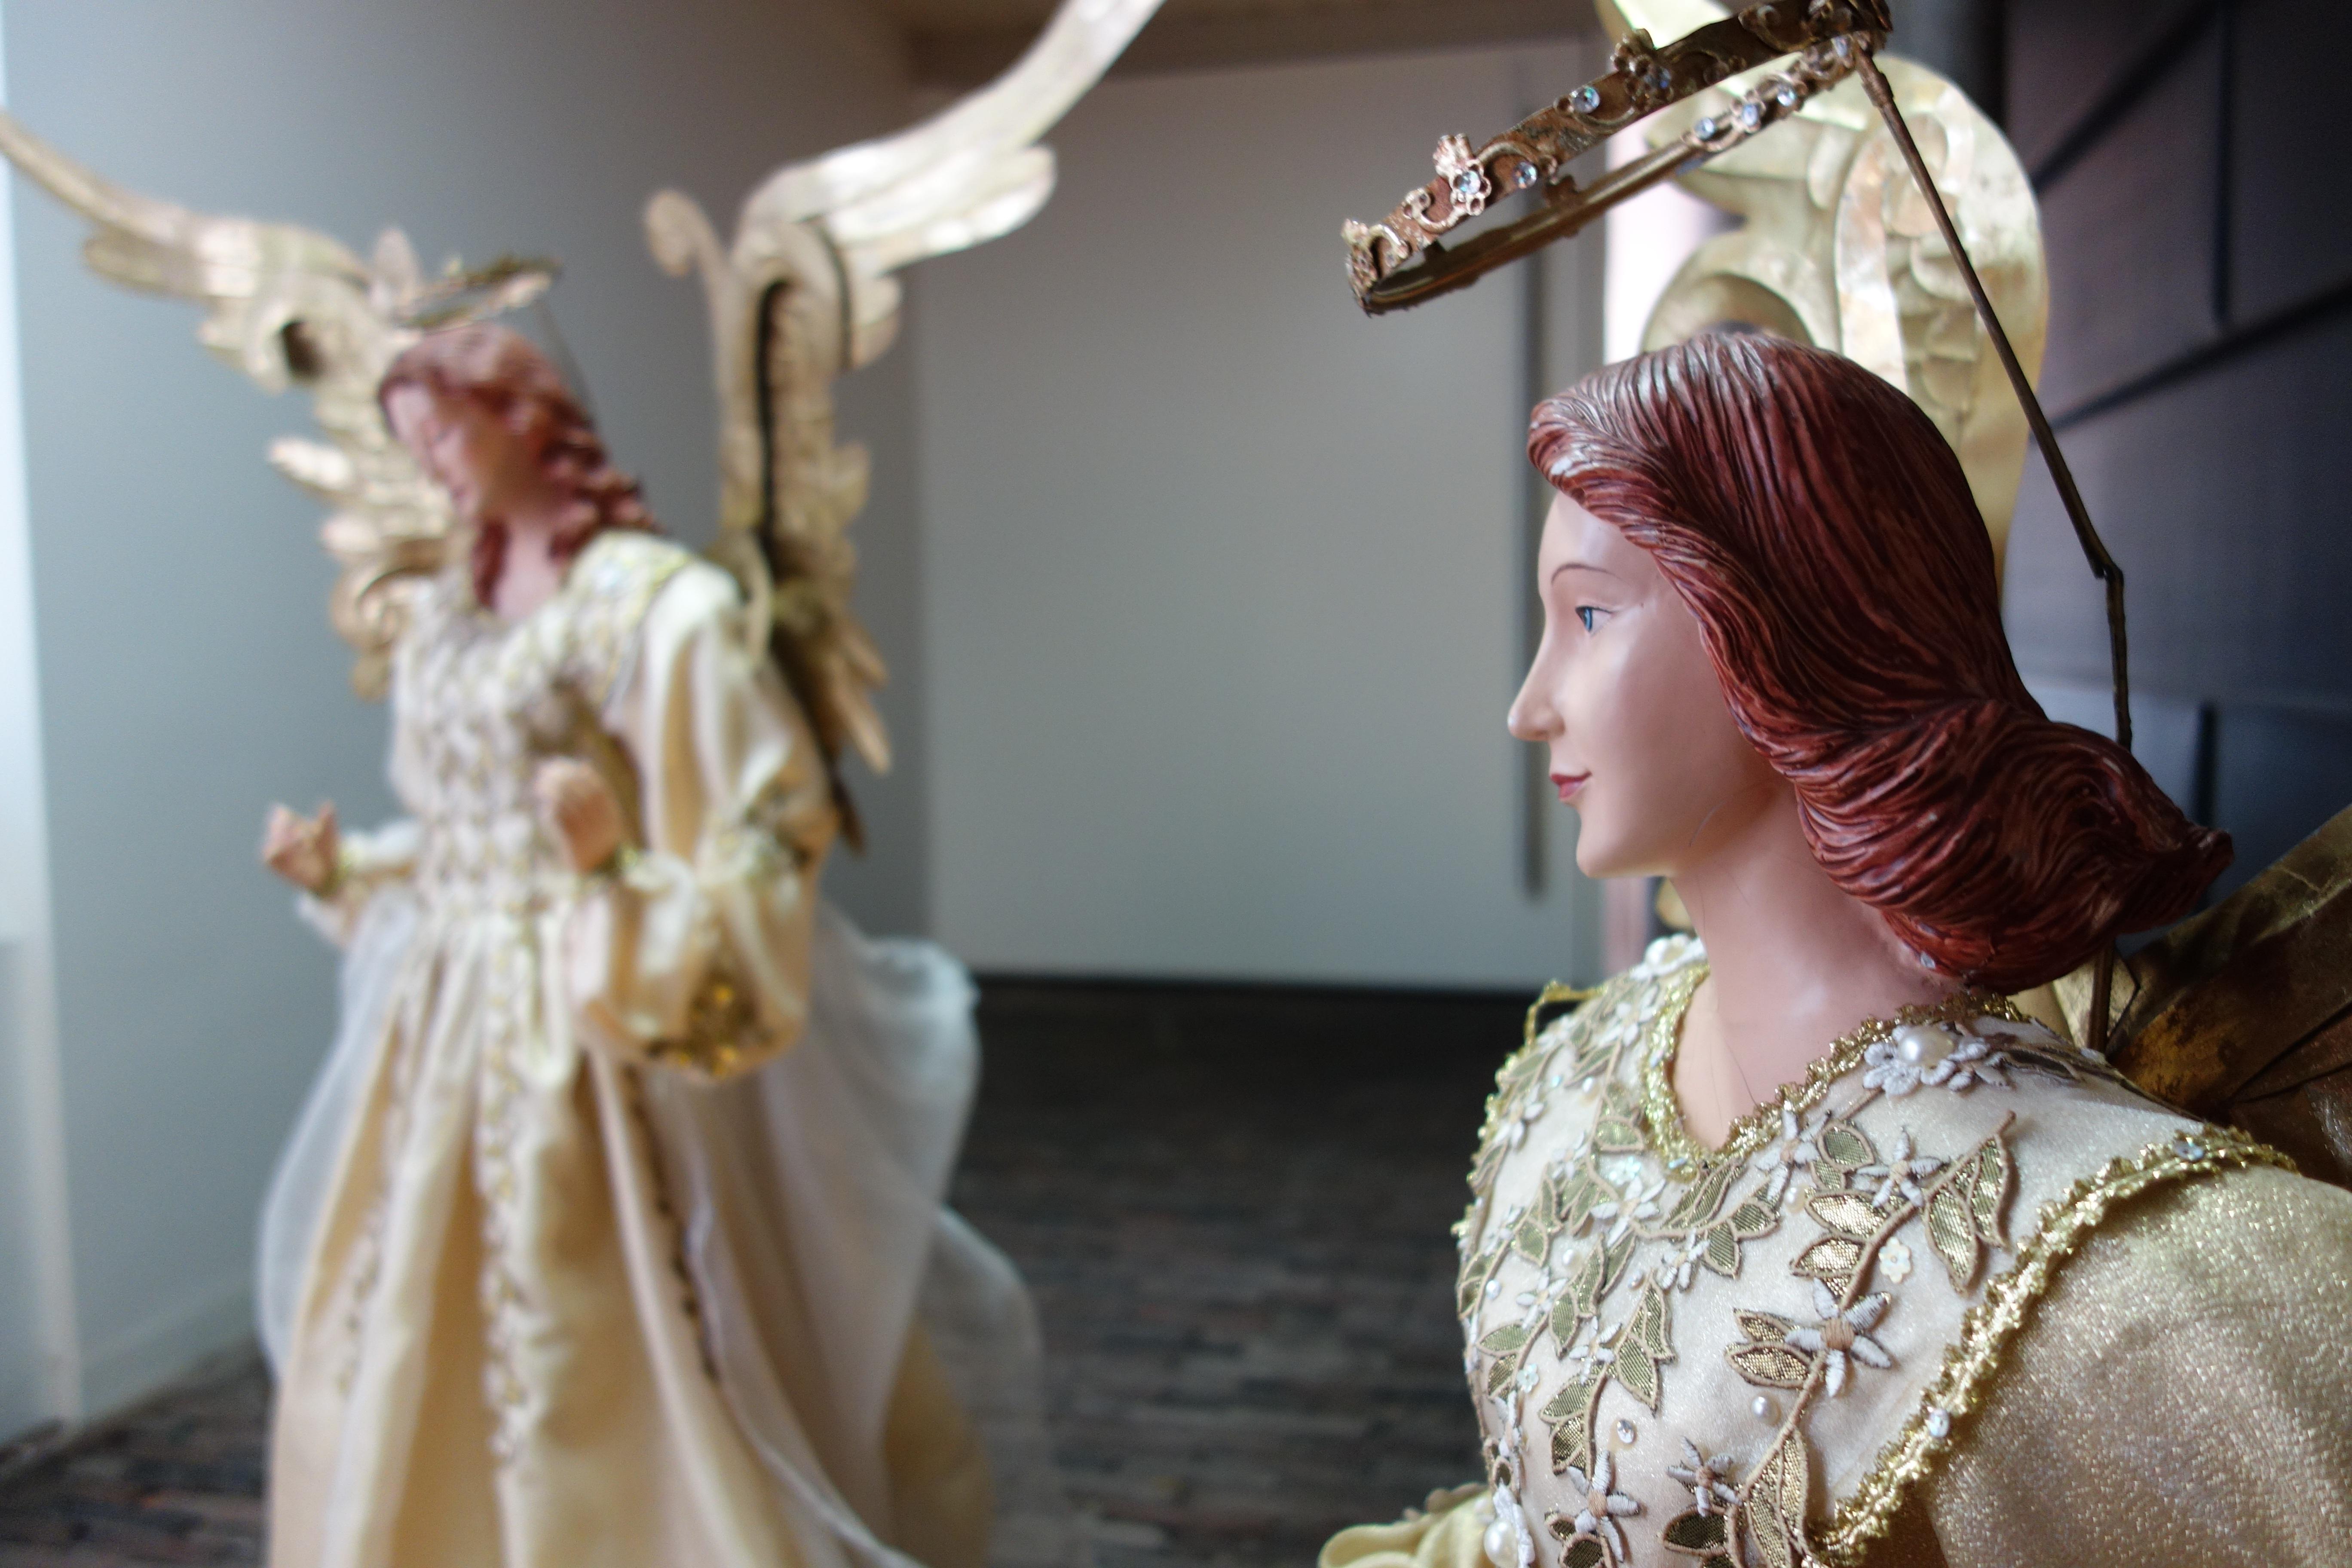 wanita patung mode pengantin Katolik malaikat gaun gaun